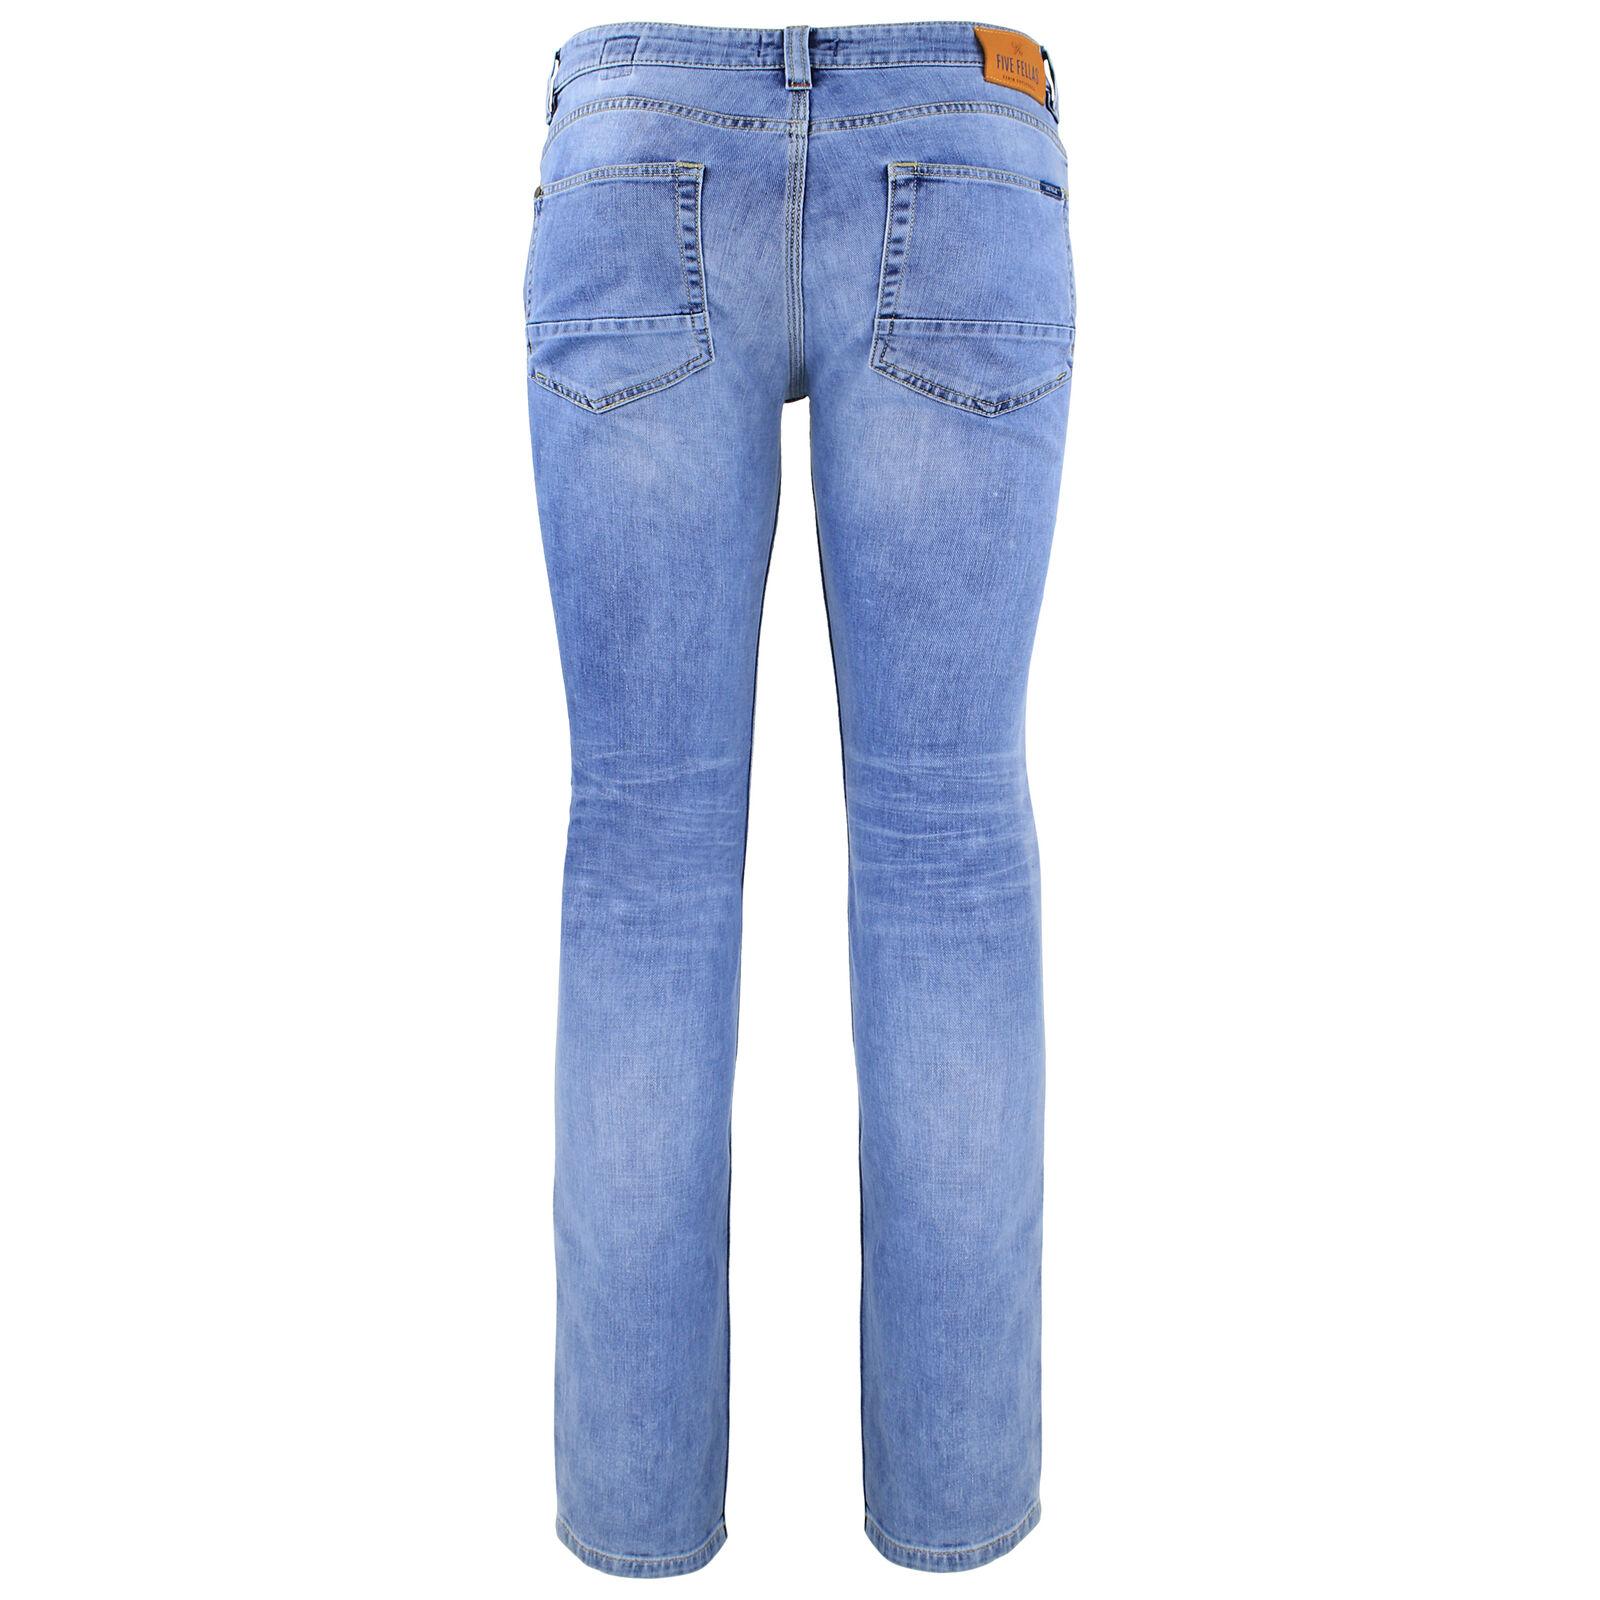 Five Fellas Luuk Straight Fit Men's Jeans, Used Look, Candiani Denim, bluee